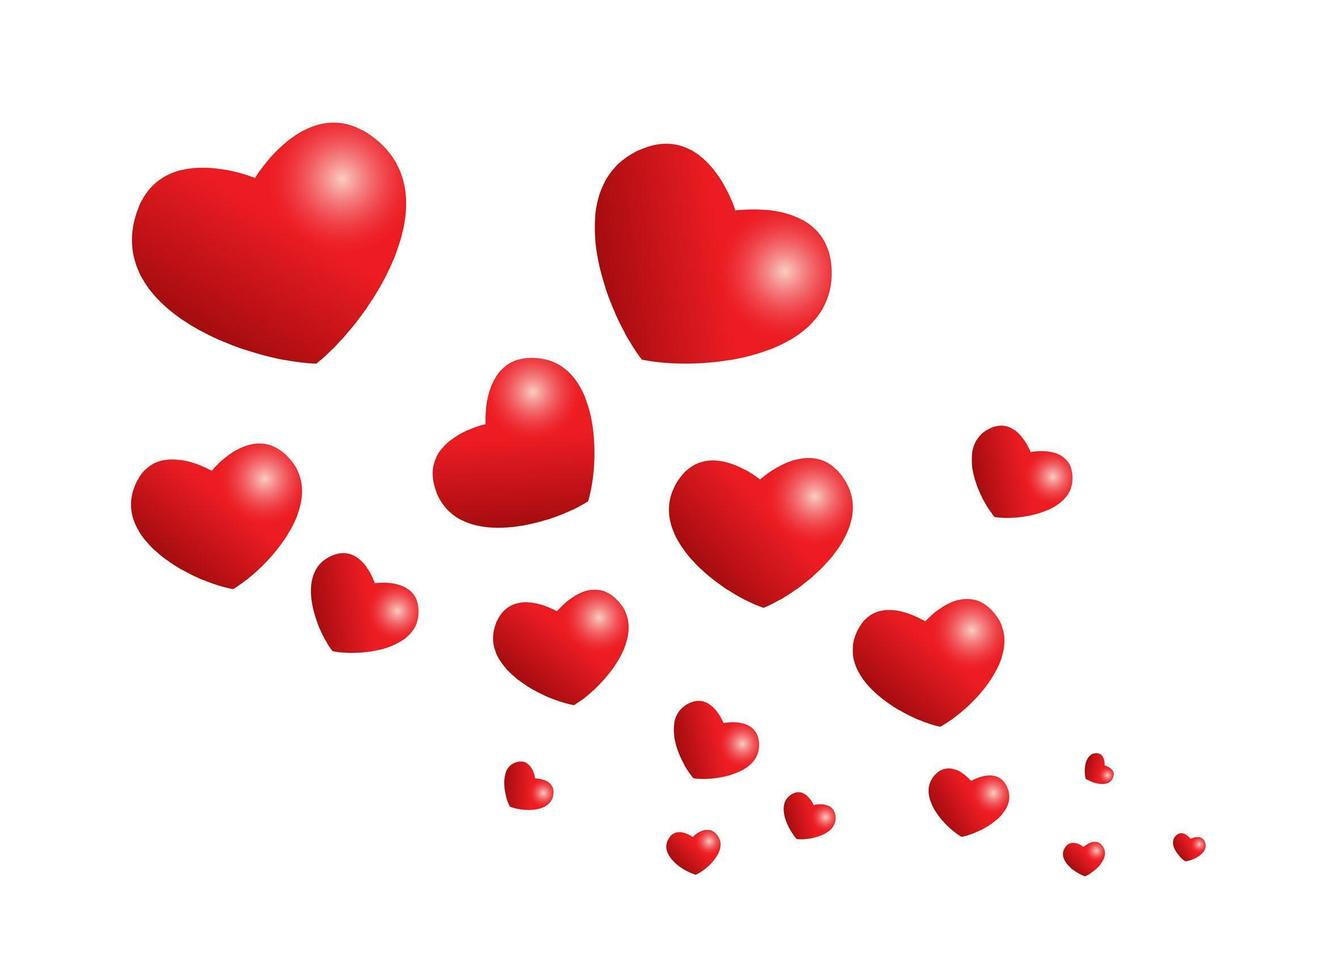 Herzen bilder kostenlos